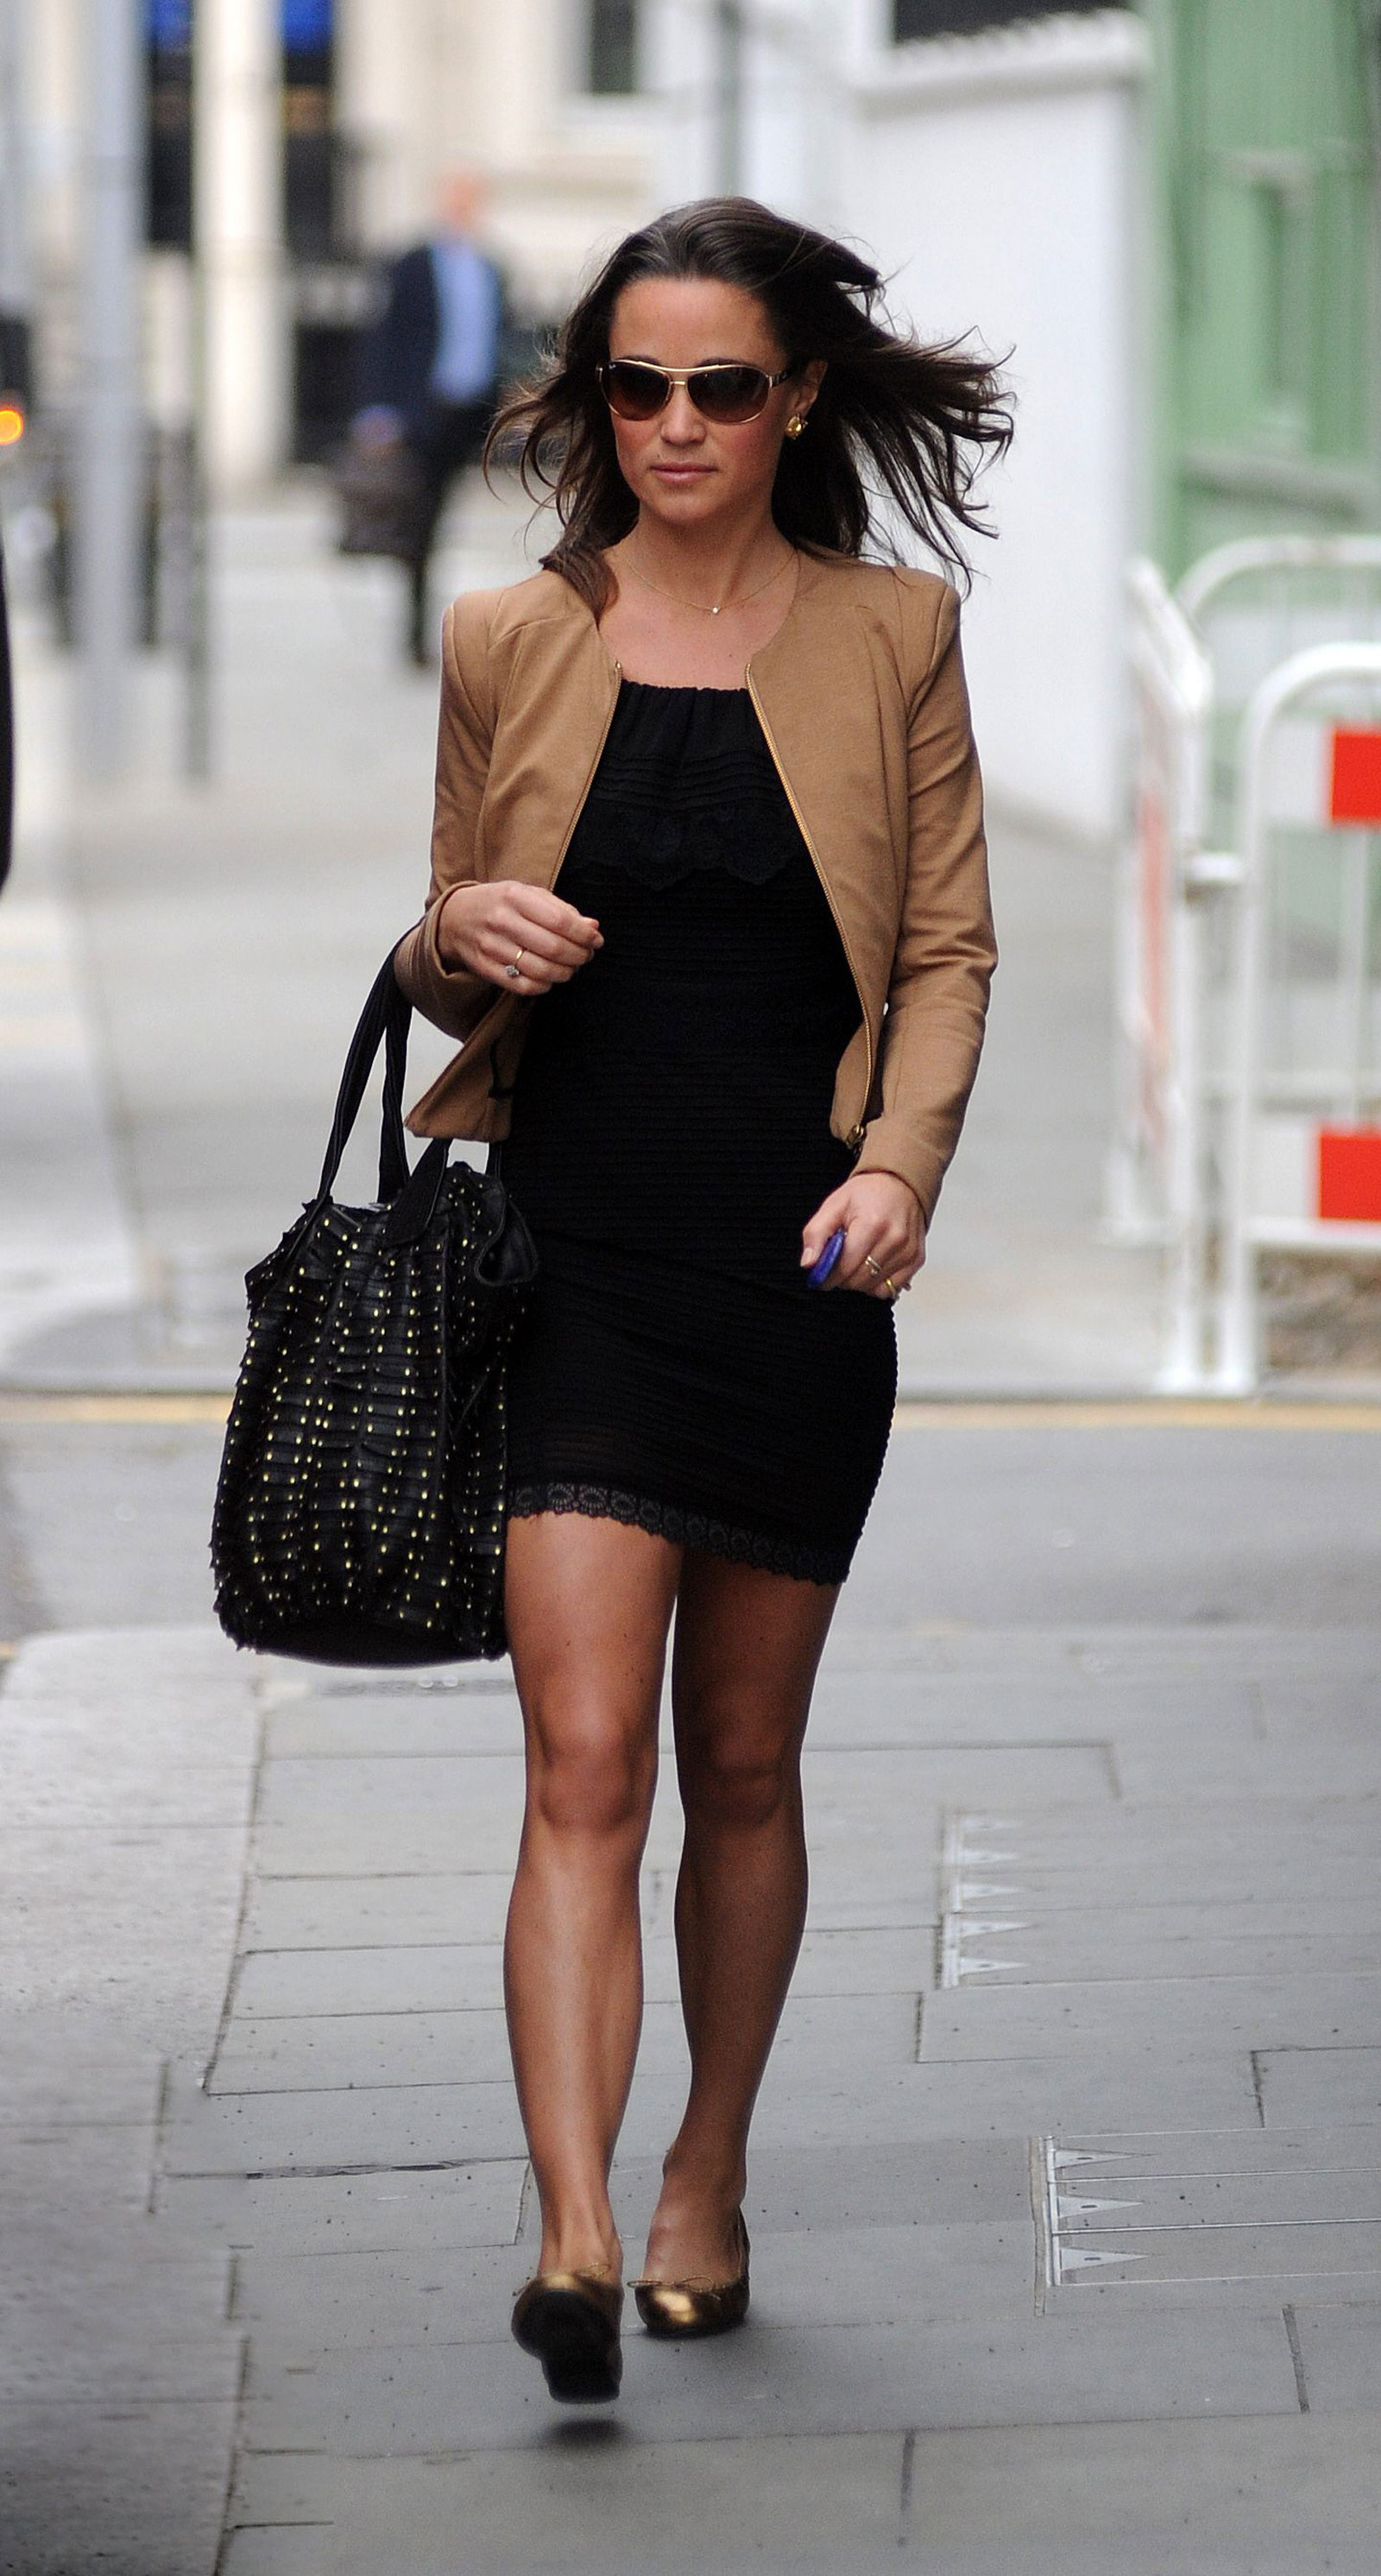 Pippa Middleton - Red Dress Candids in London-03 - GotCeleb